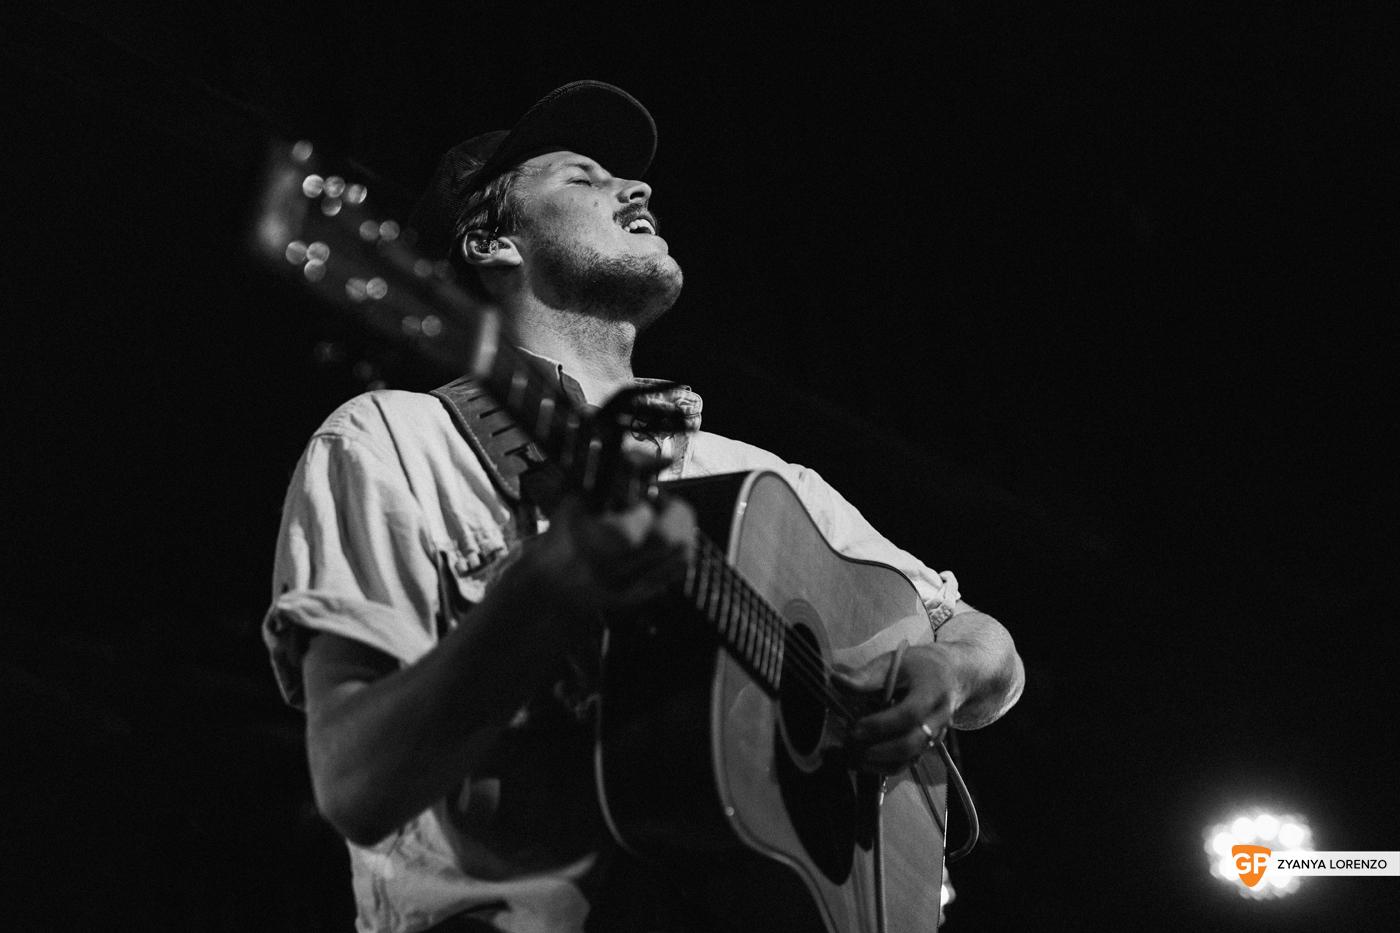 Ziggy Alberts live at Whelan's, Dublin. Photographed by Zyanya Lorenzo.